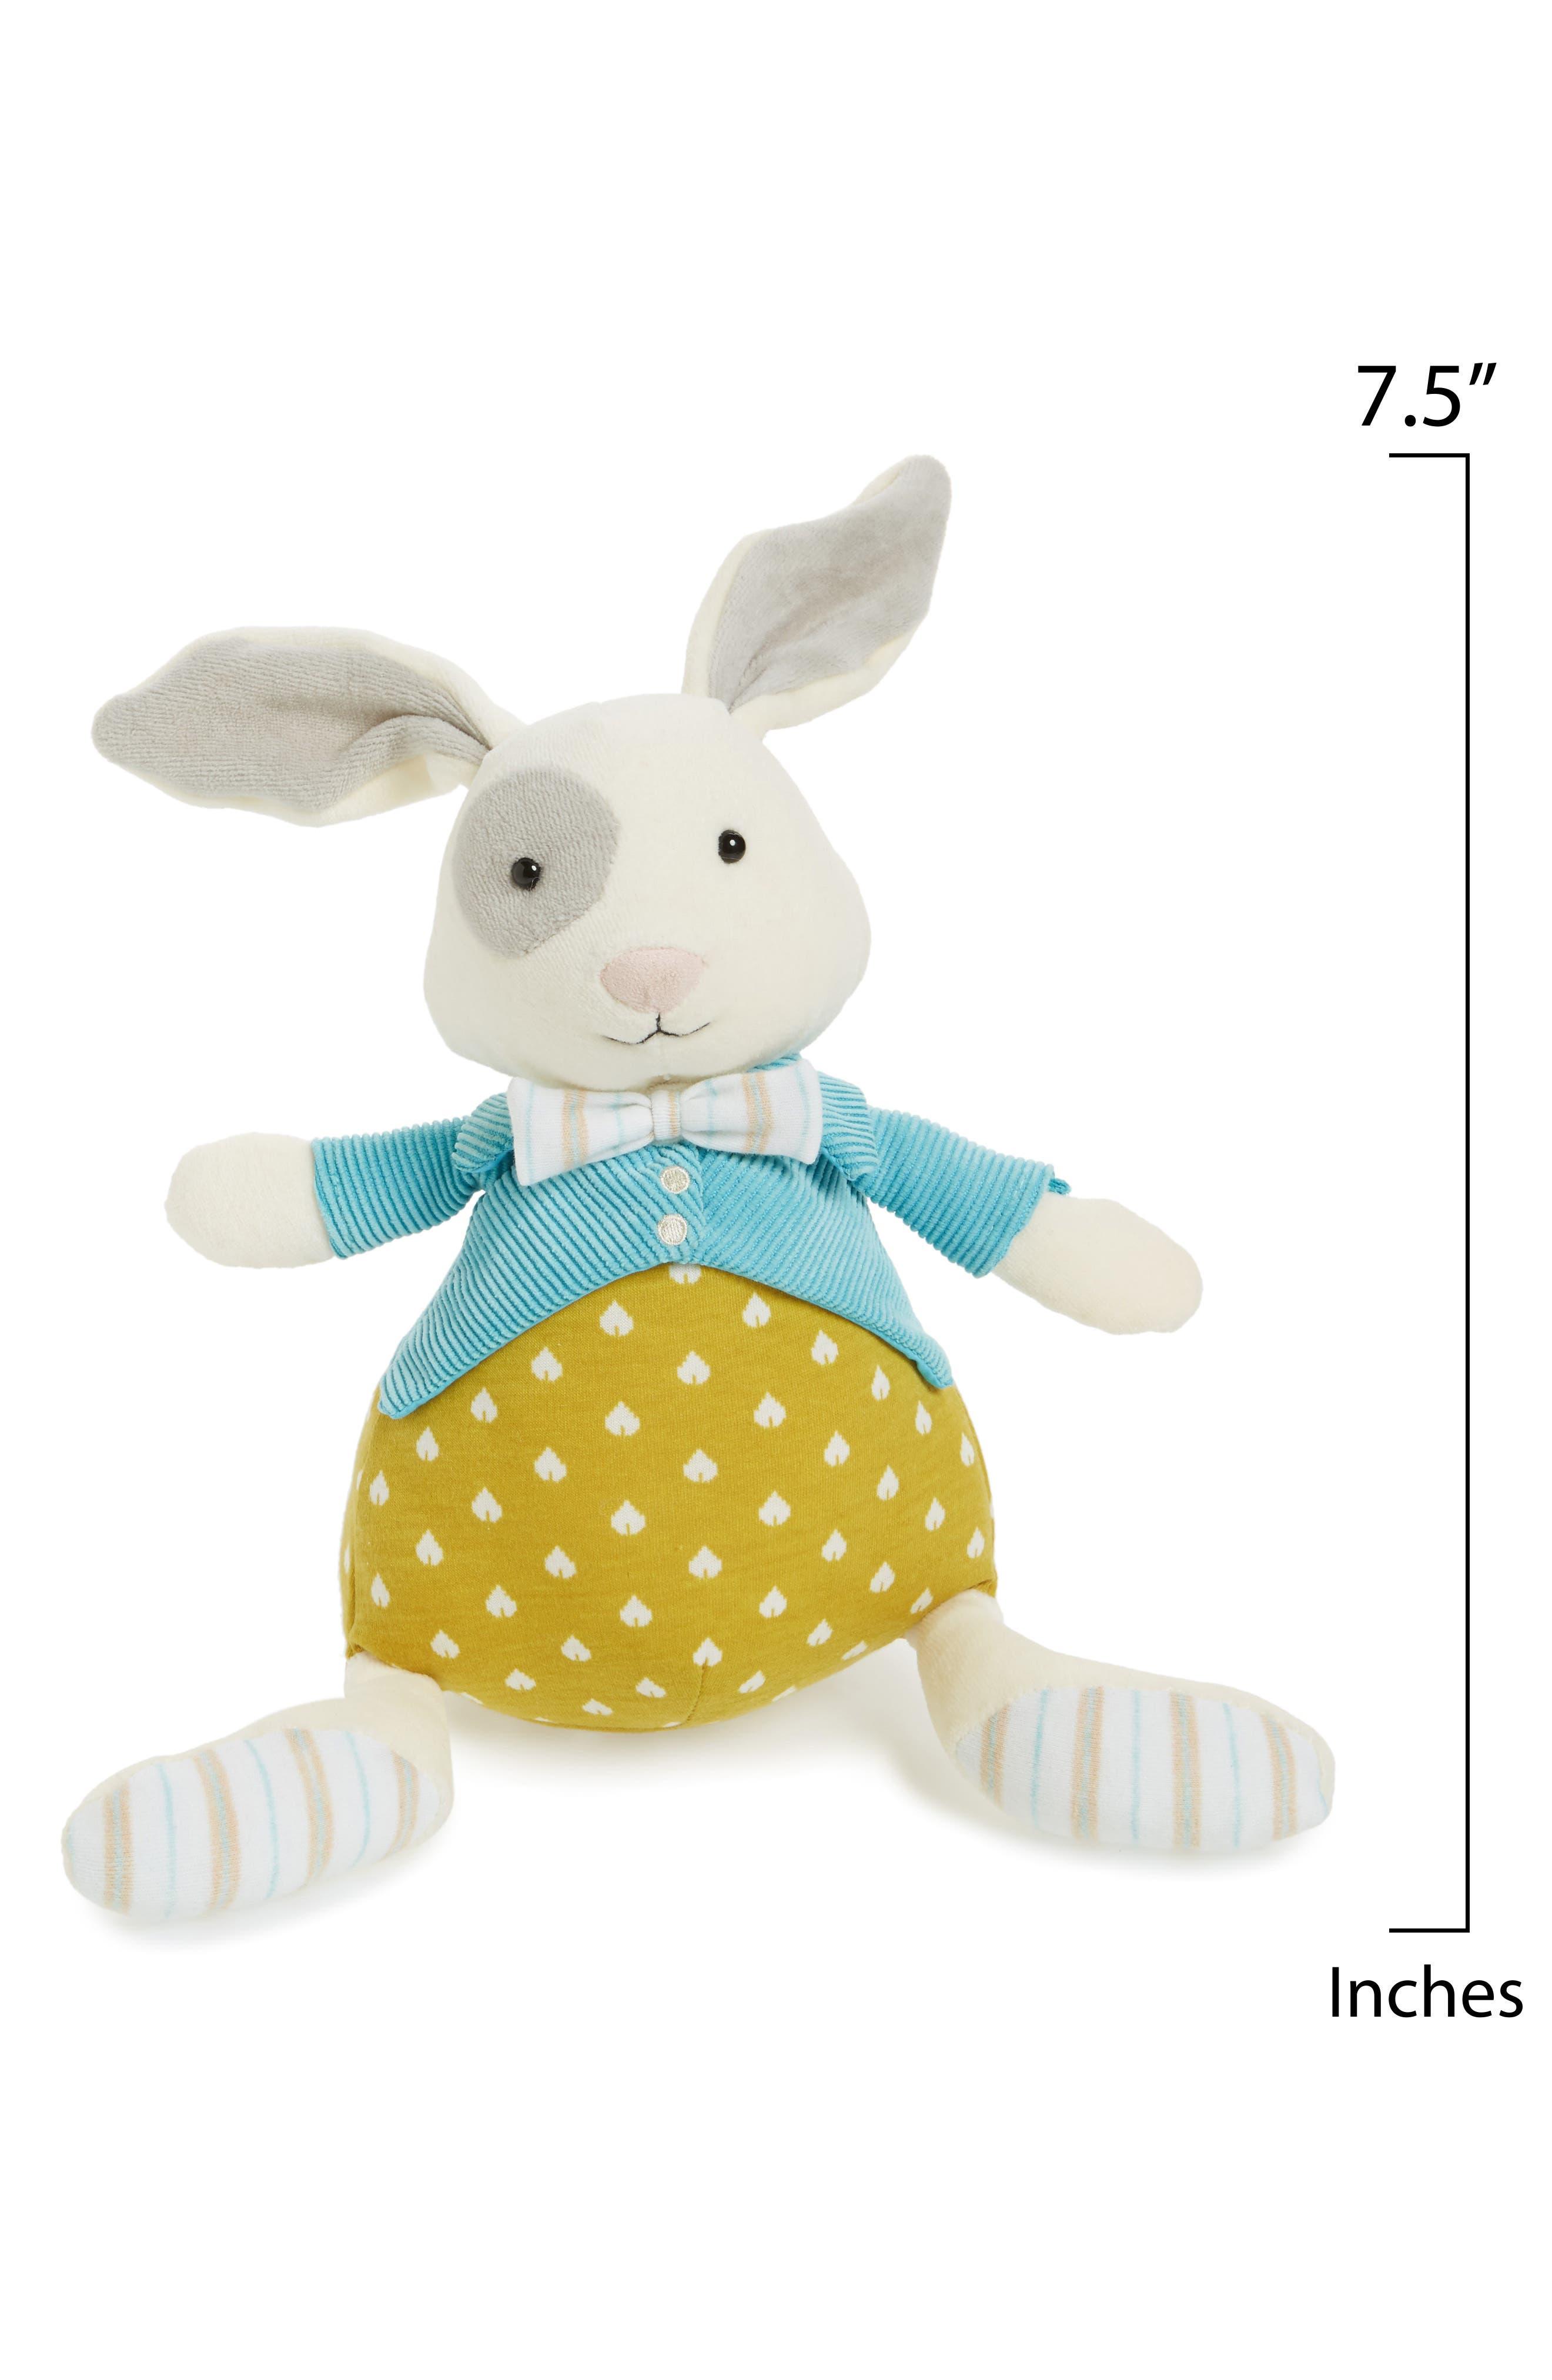 Lewis Rabbit Stuffed Animal,                             Alternate thumbnail 2, color,                             300